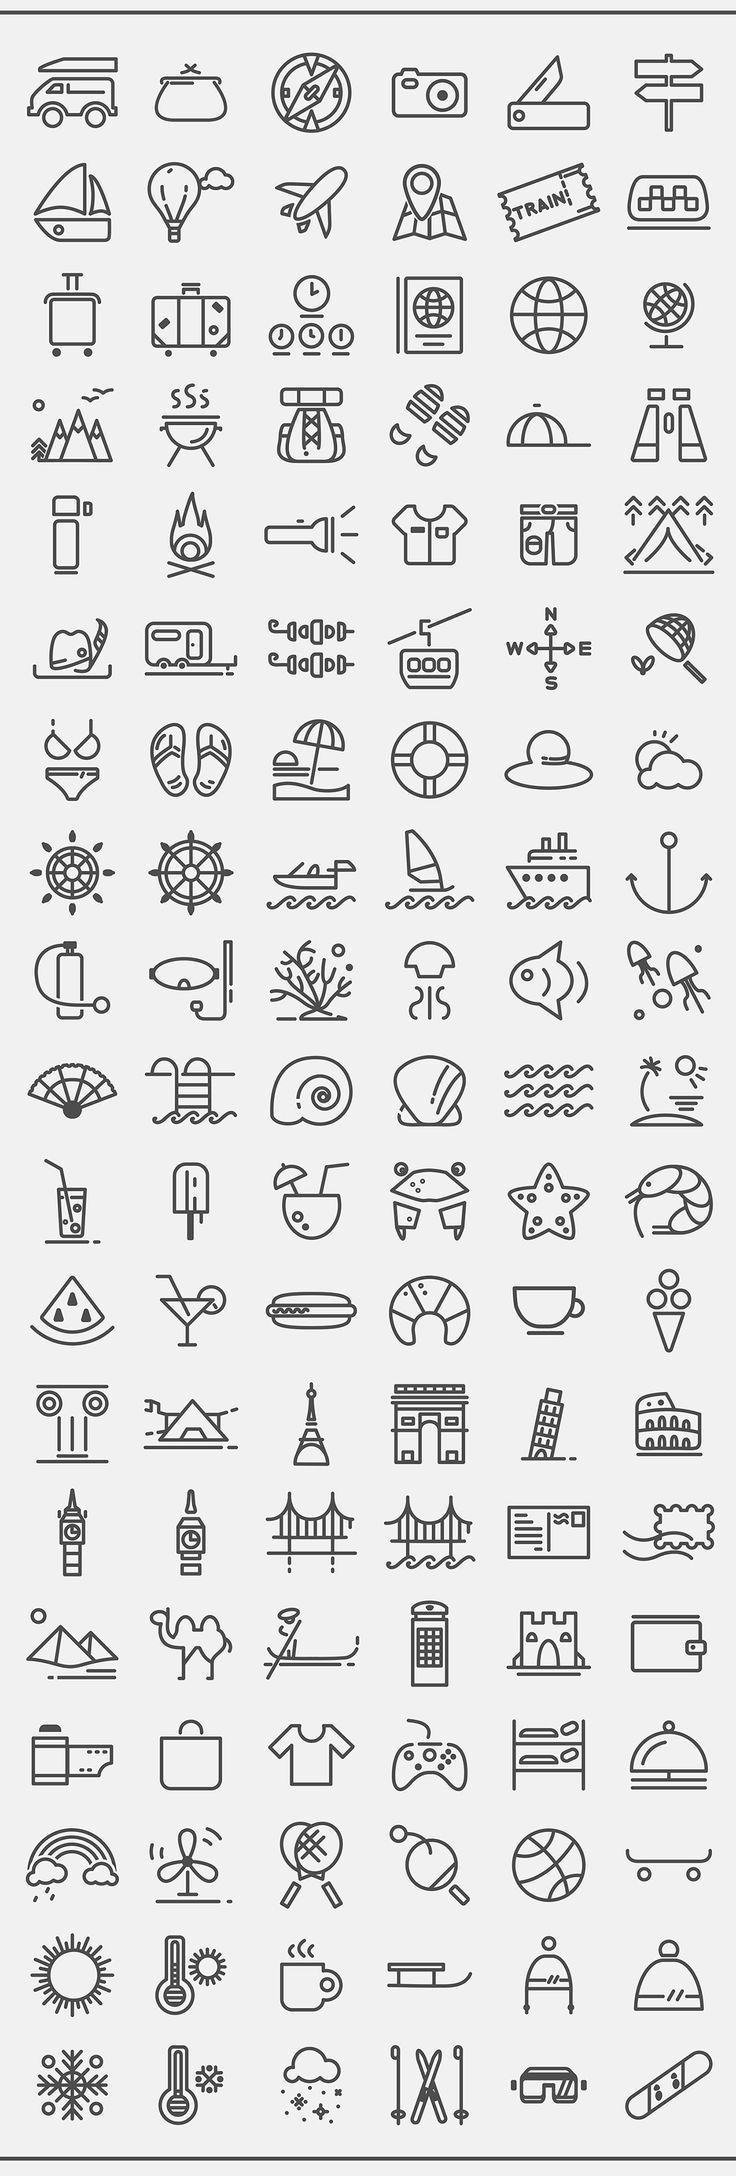 Free Travelling icon set on Behance: